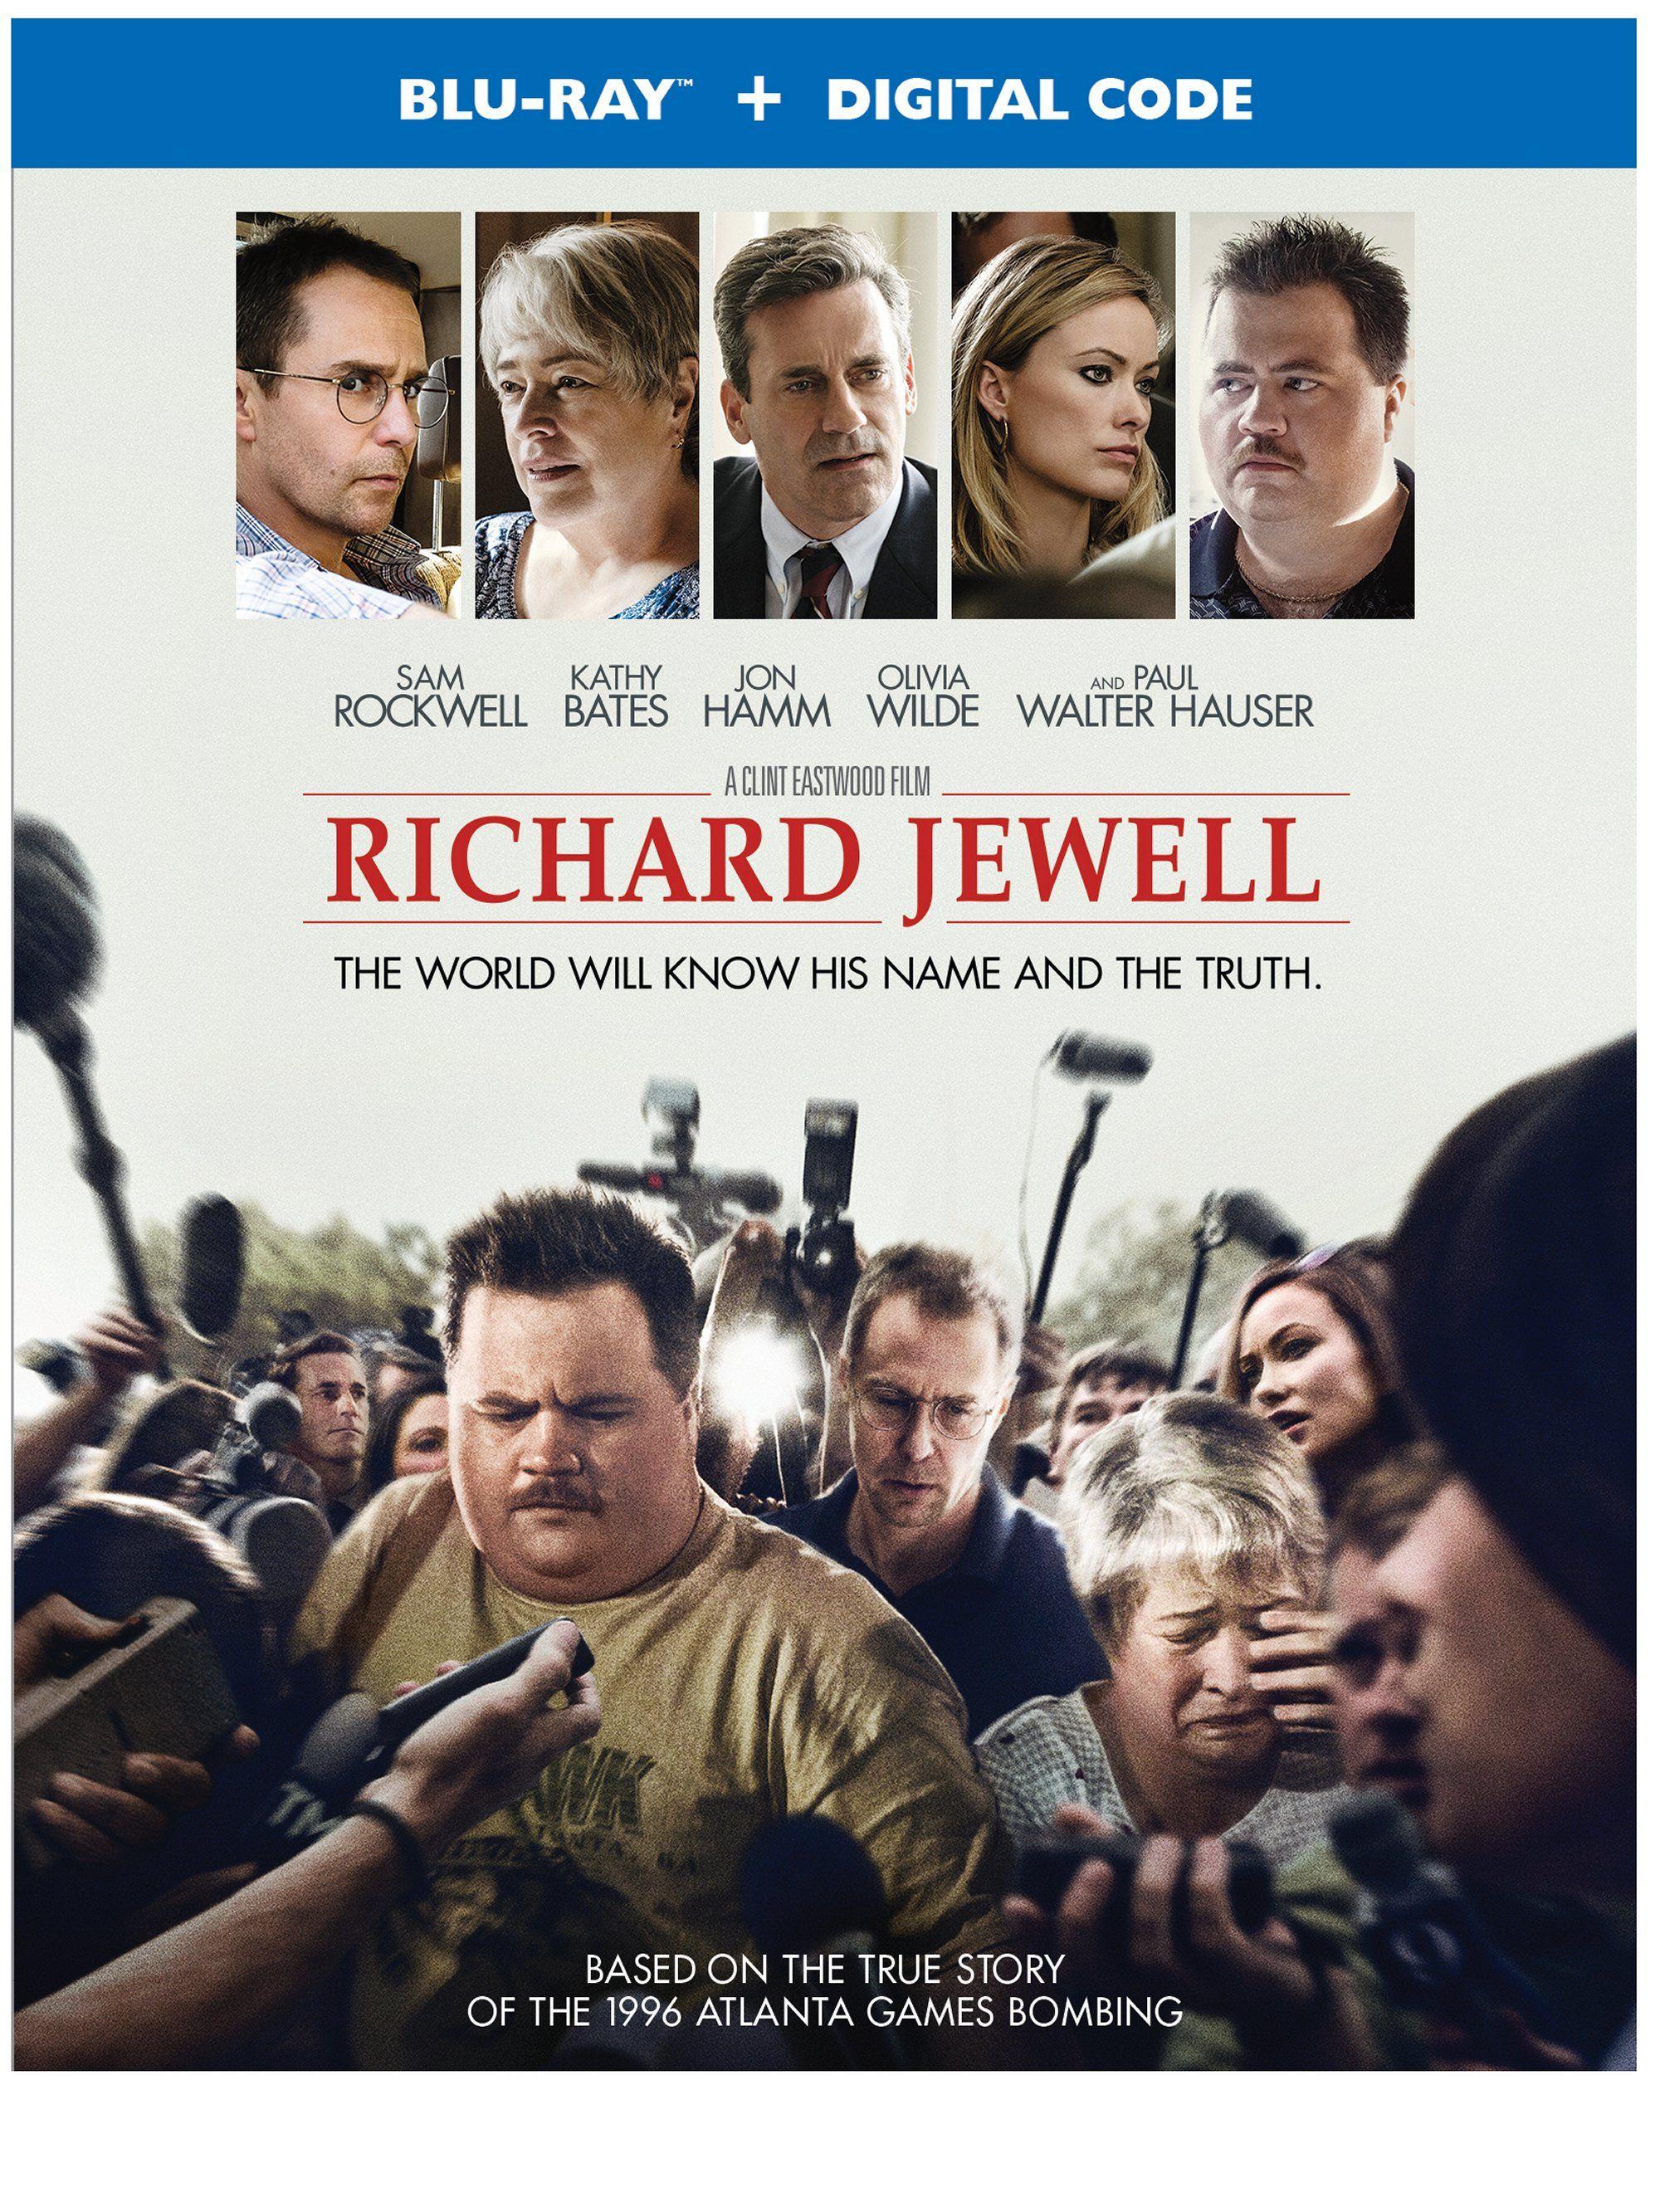 Richard Jewell Blu-ray Review